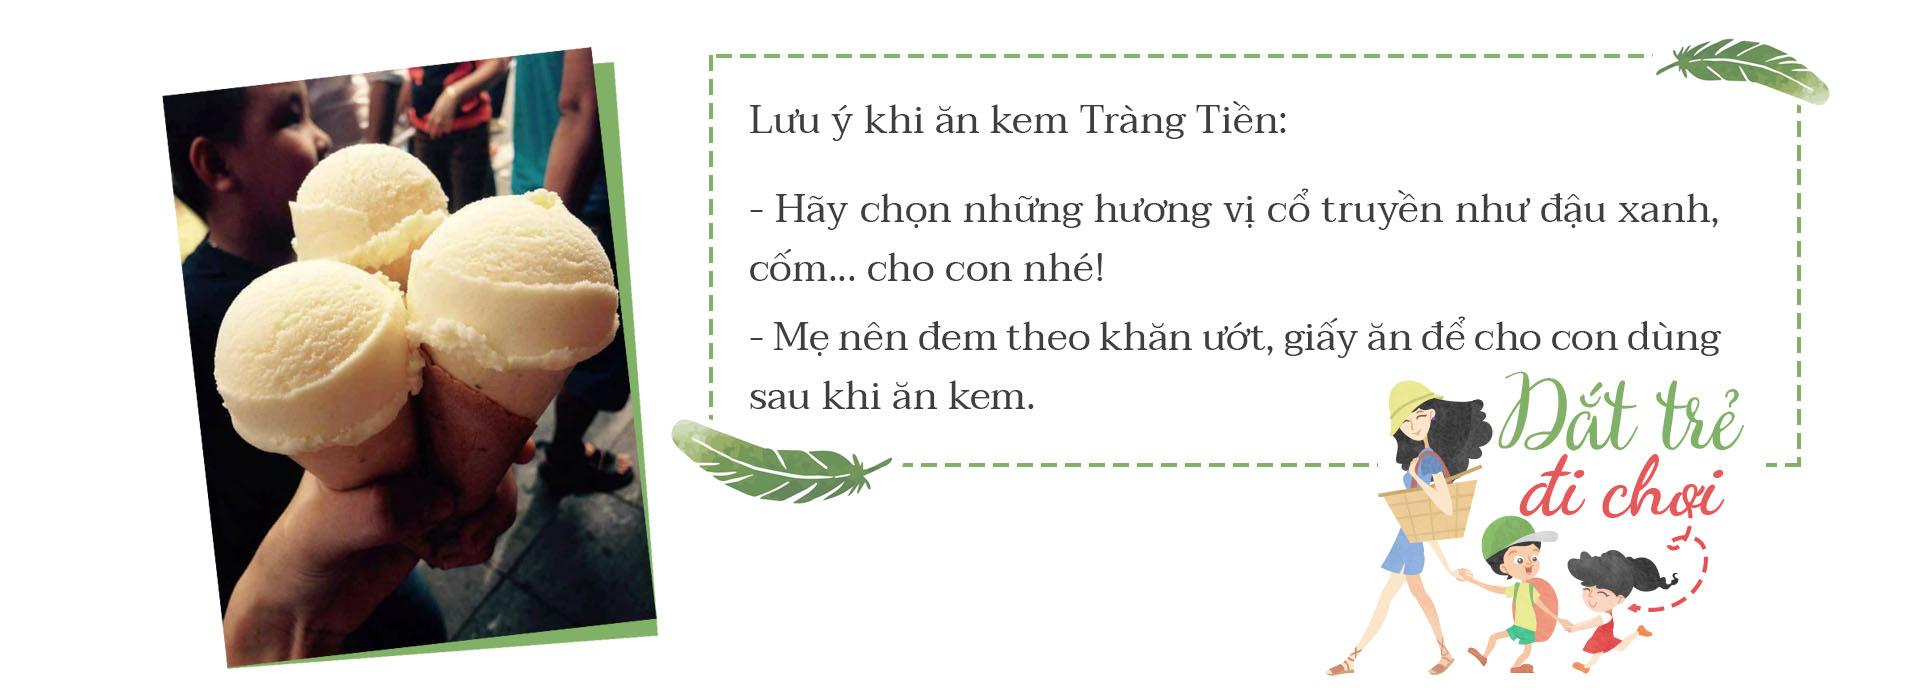 hay de tre con huong thu mot pho di bo hoan toan khac la - 12